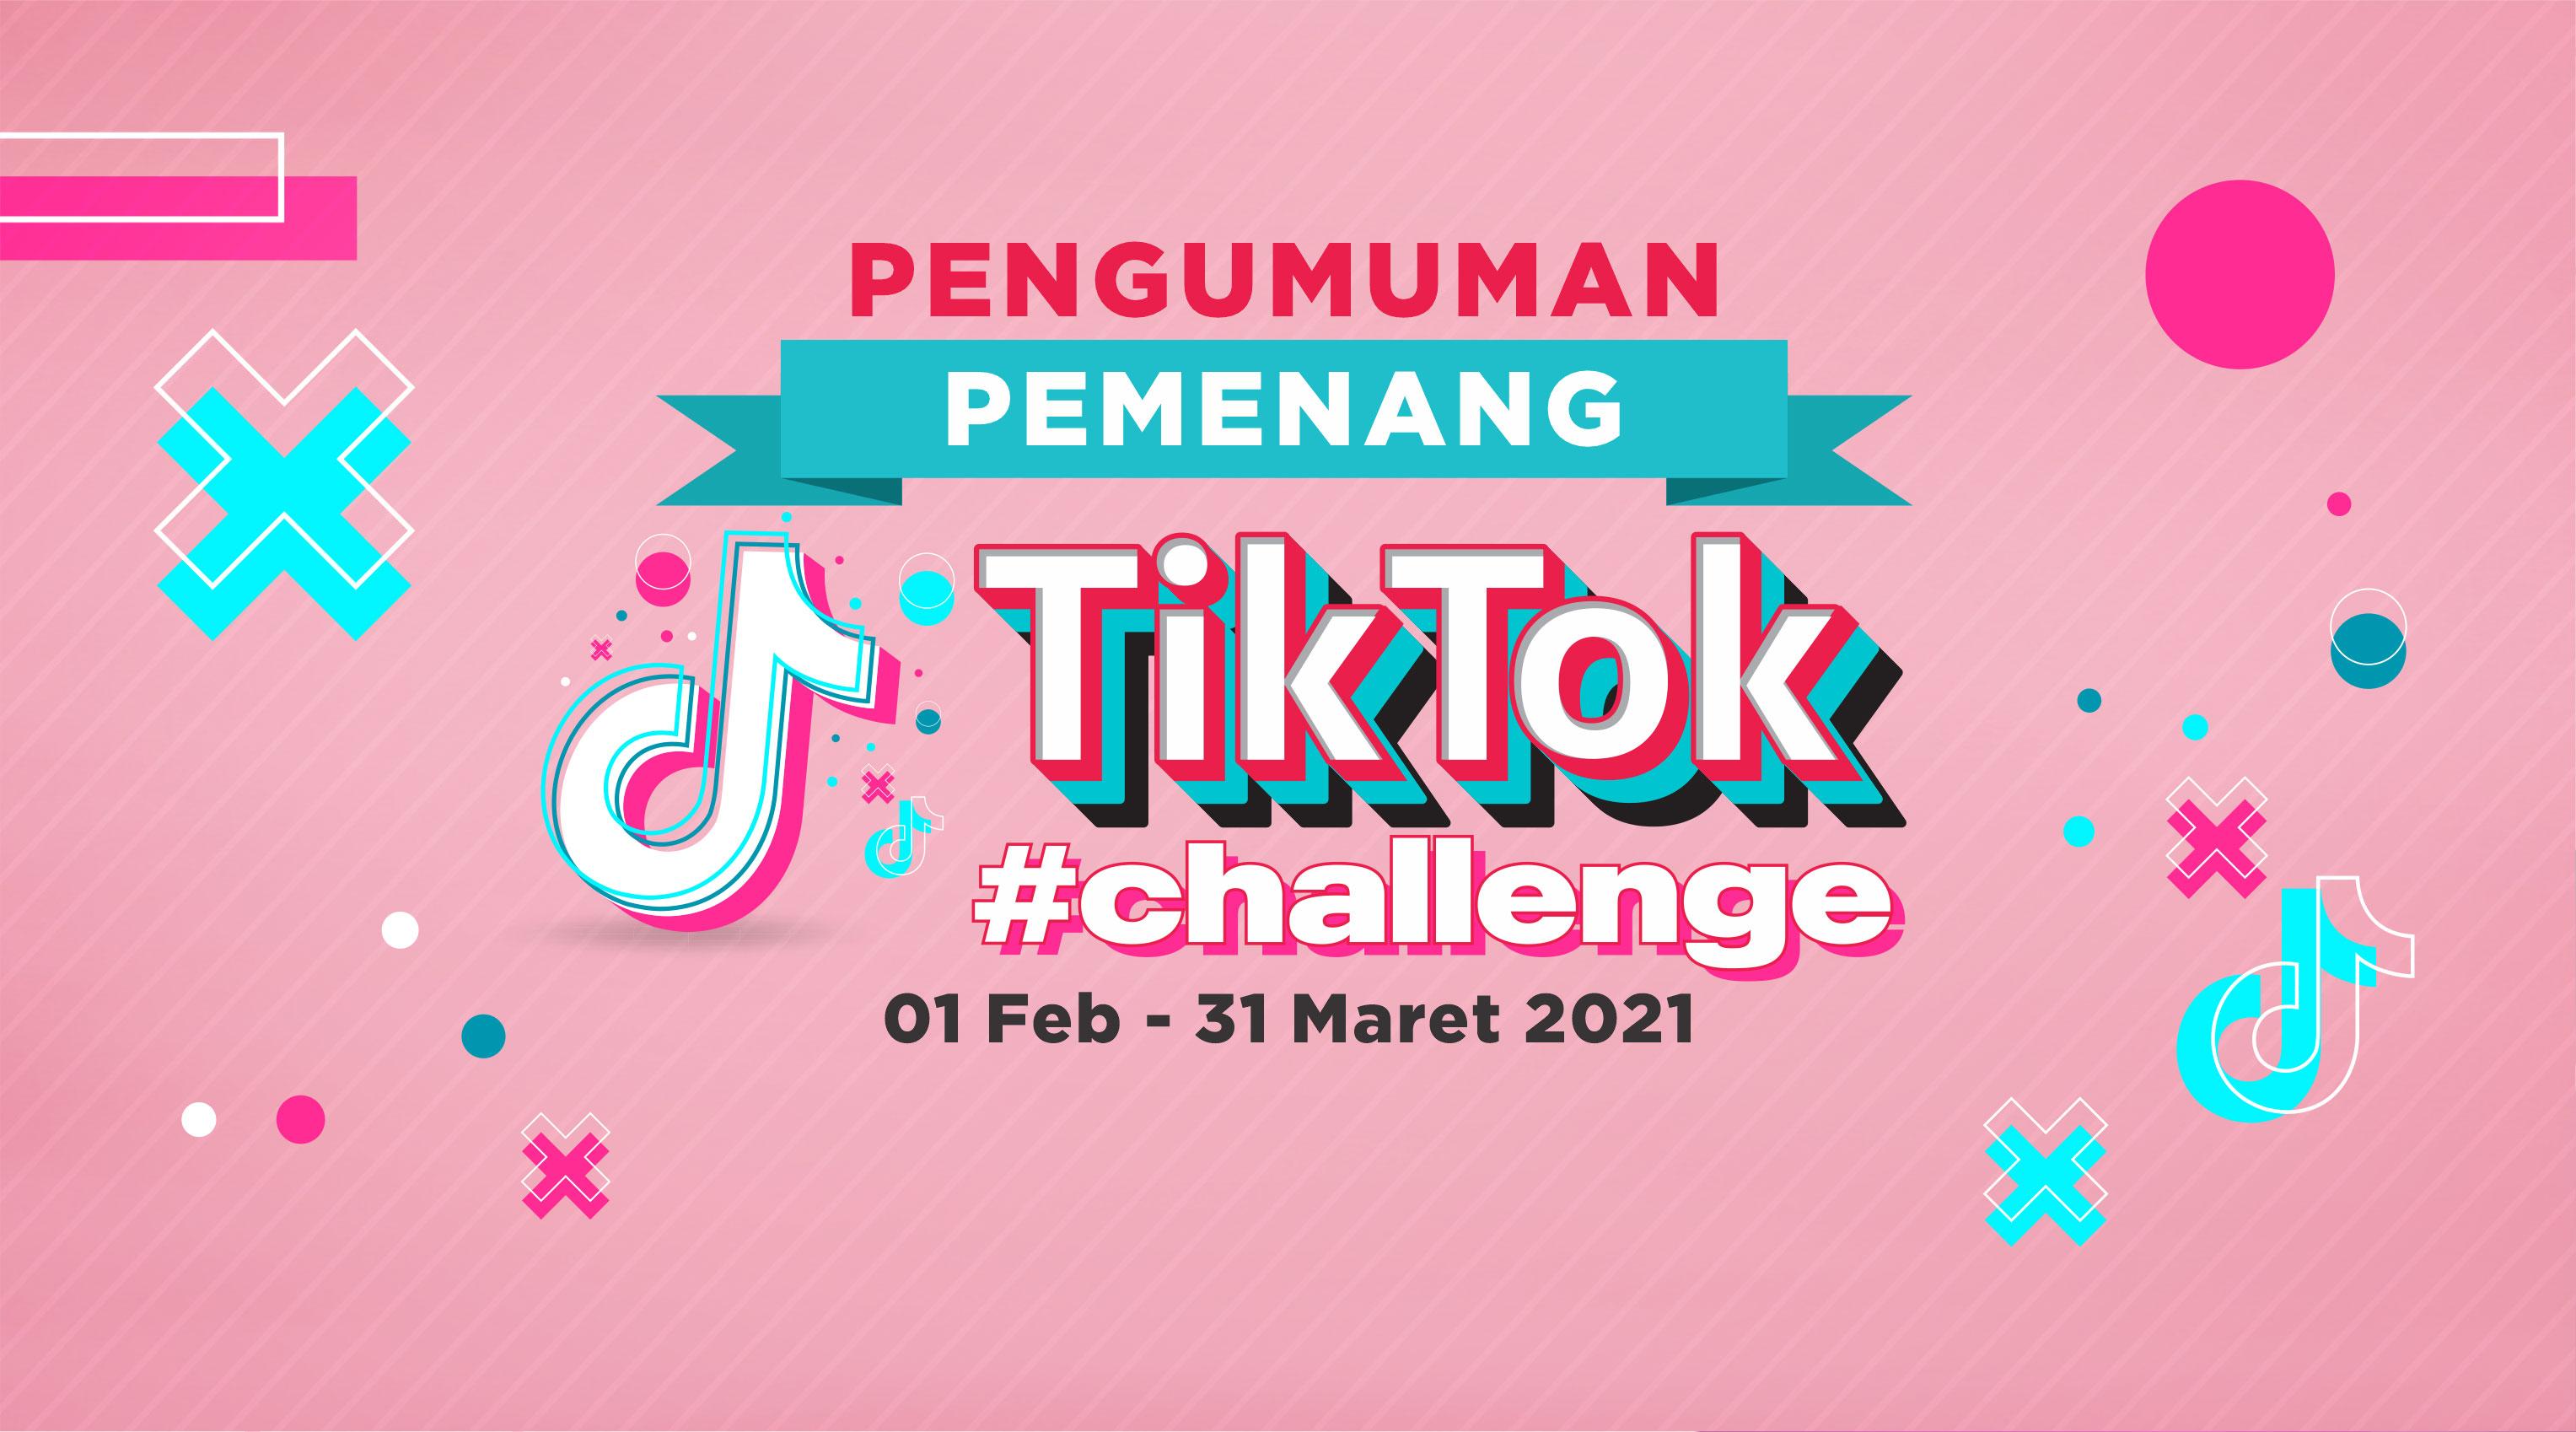 Pengumuman Tiktok Challenge 2021